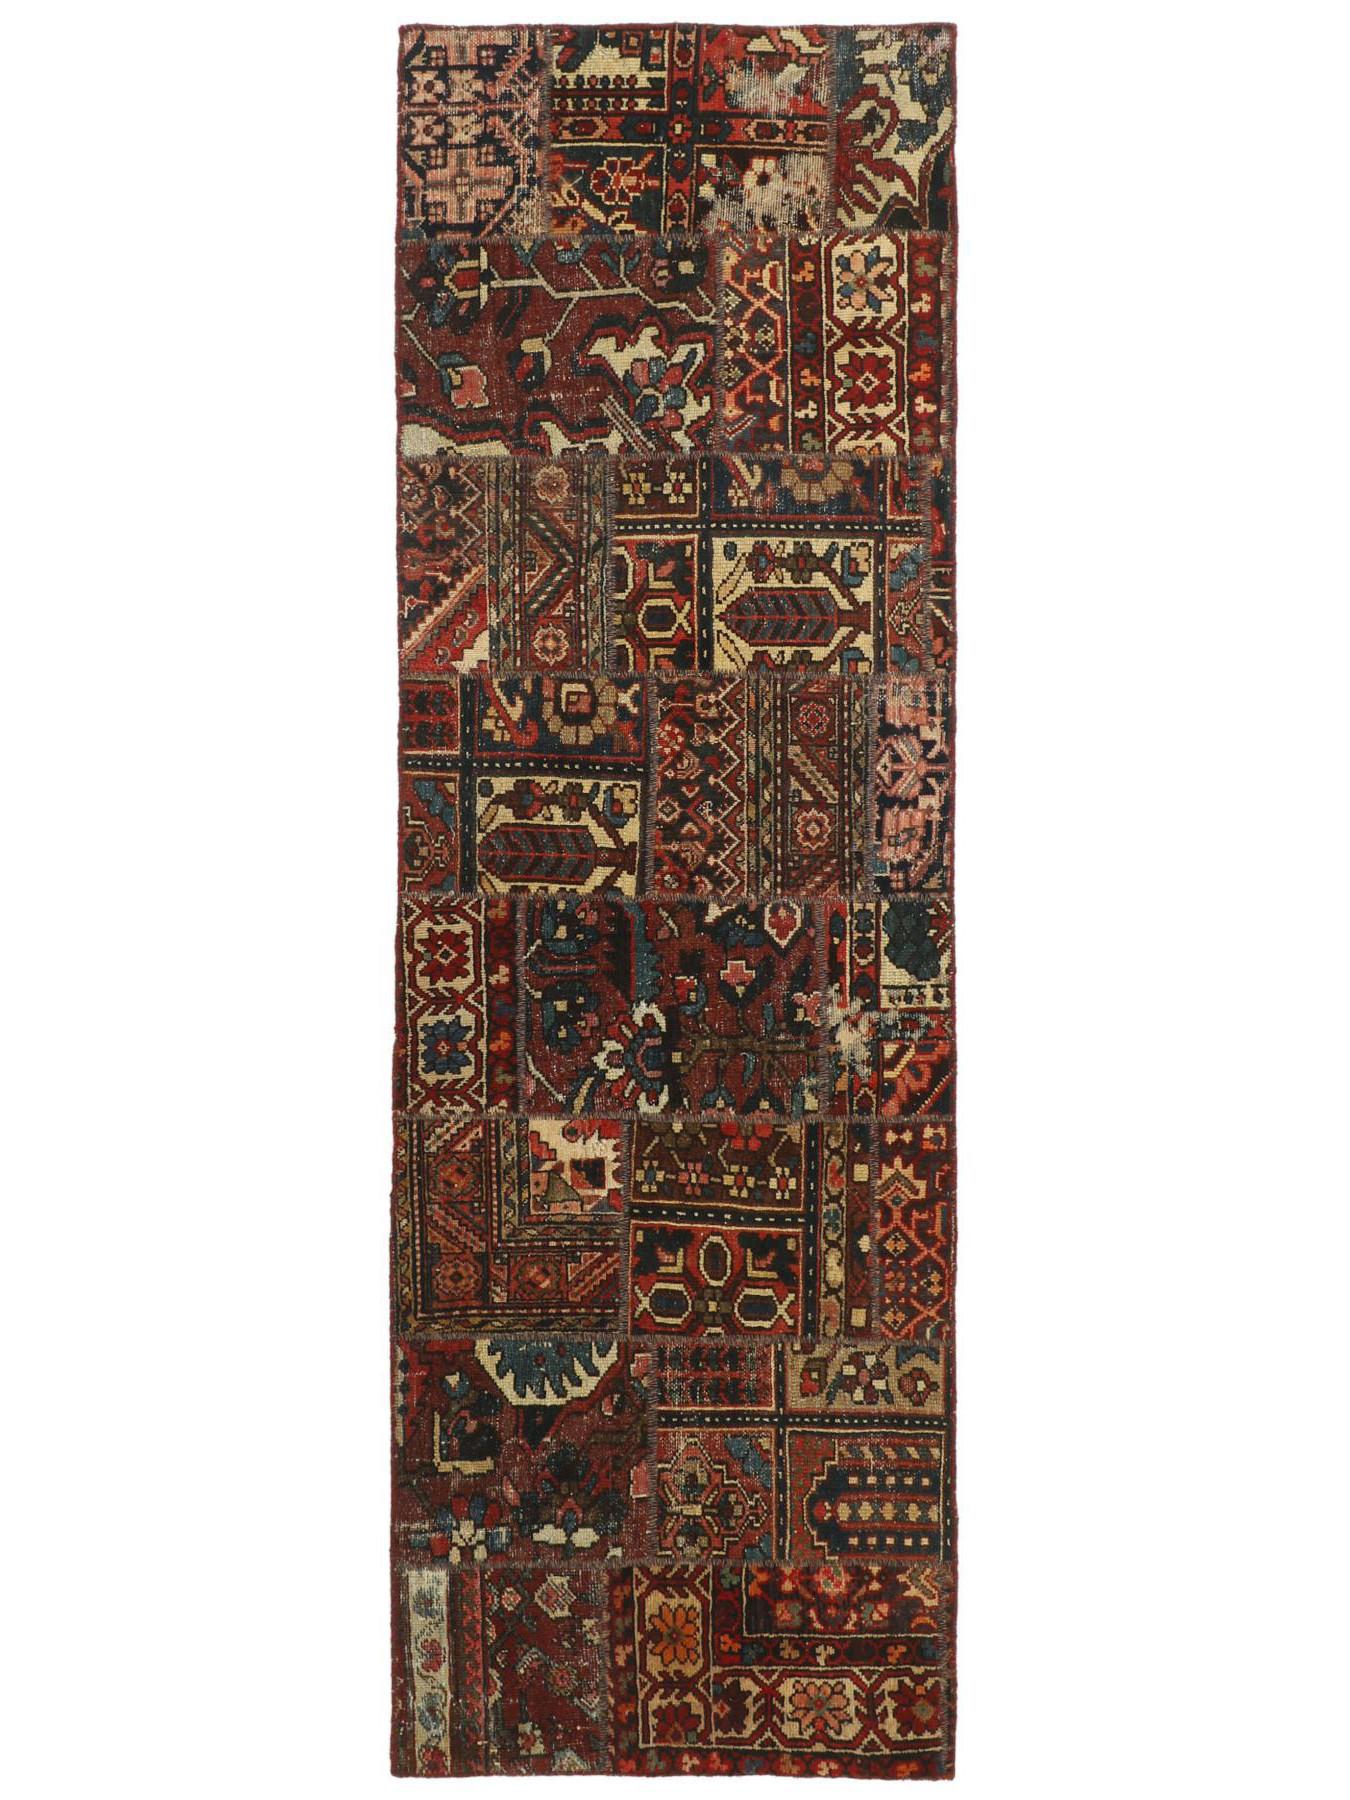 Vintage Patchwork - Vintage Persian Royal Patchwork Malayer